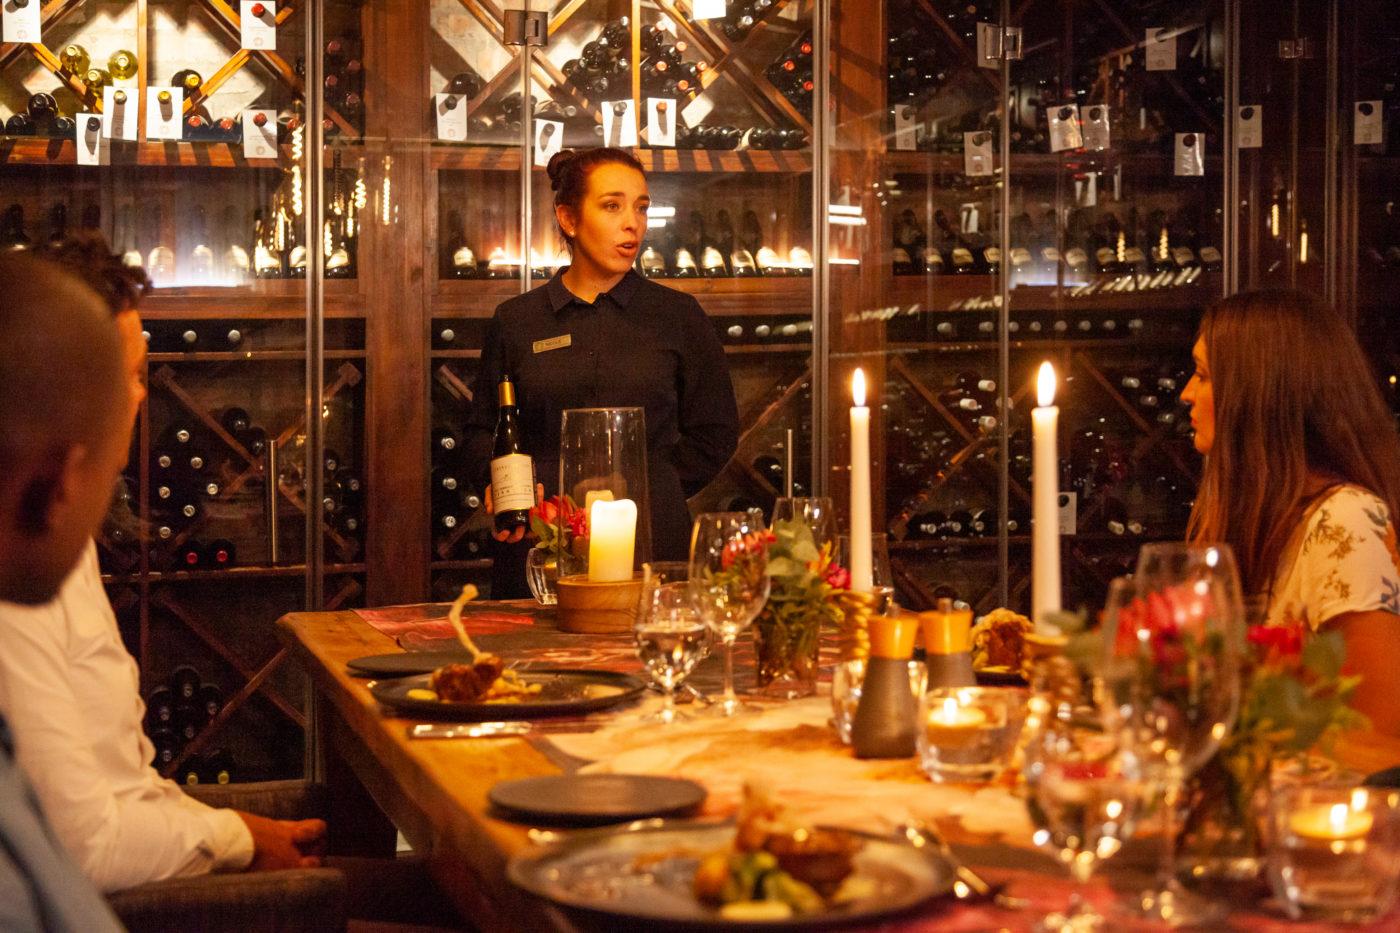 Grootbos wine cellar